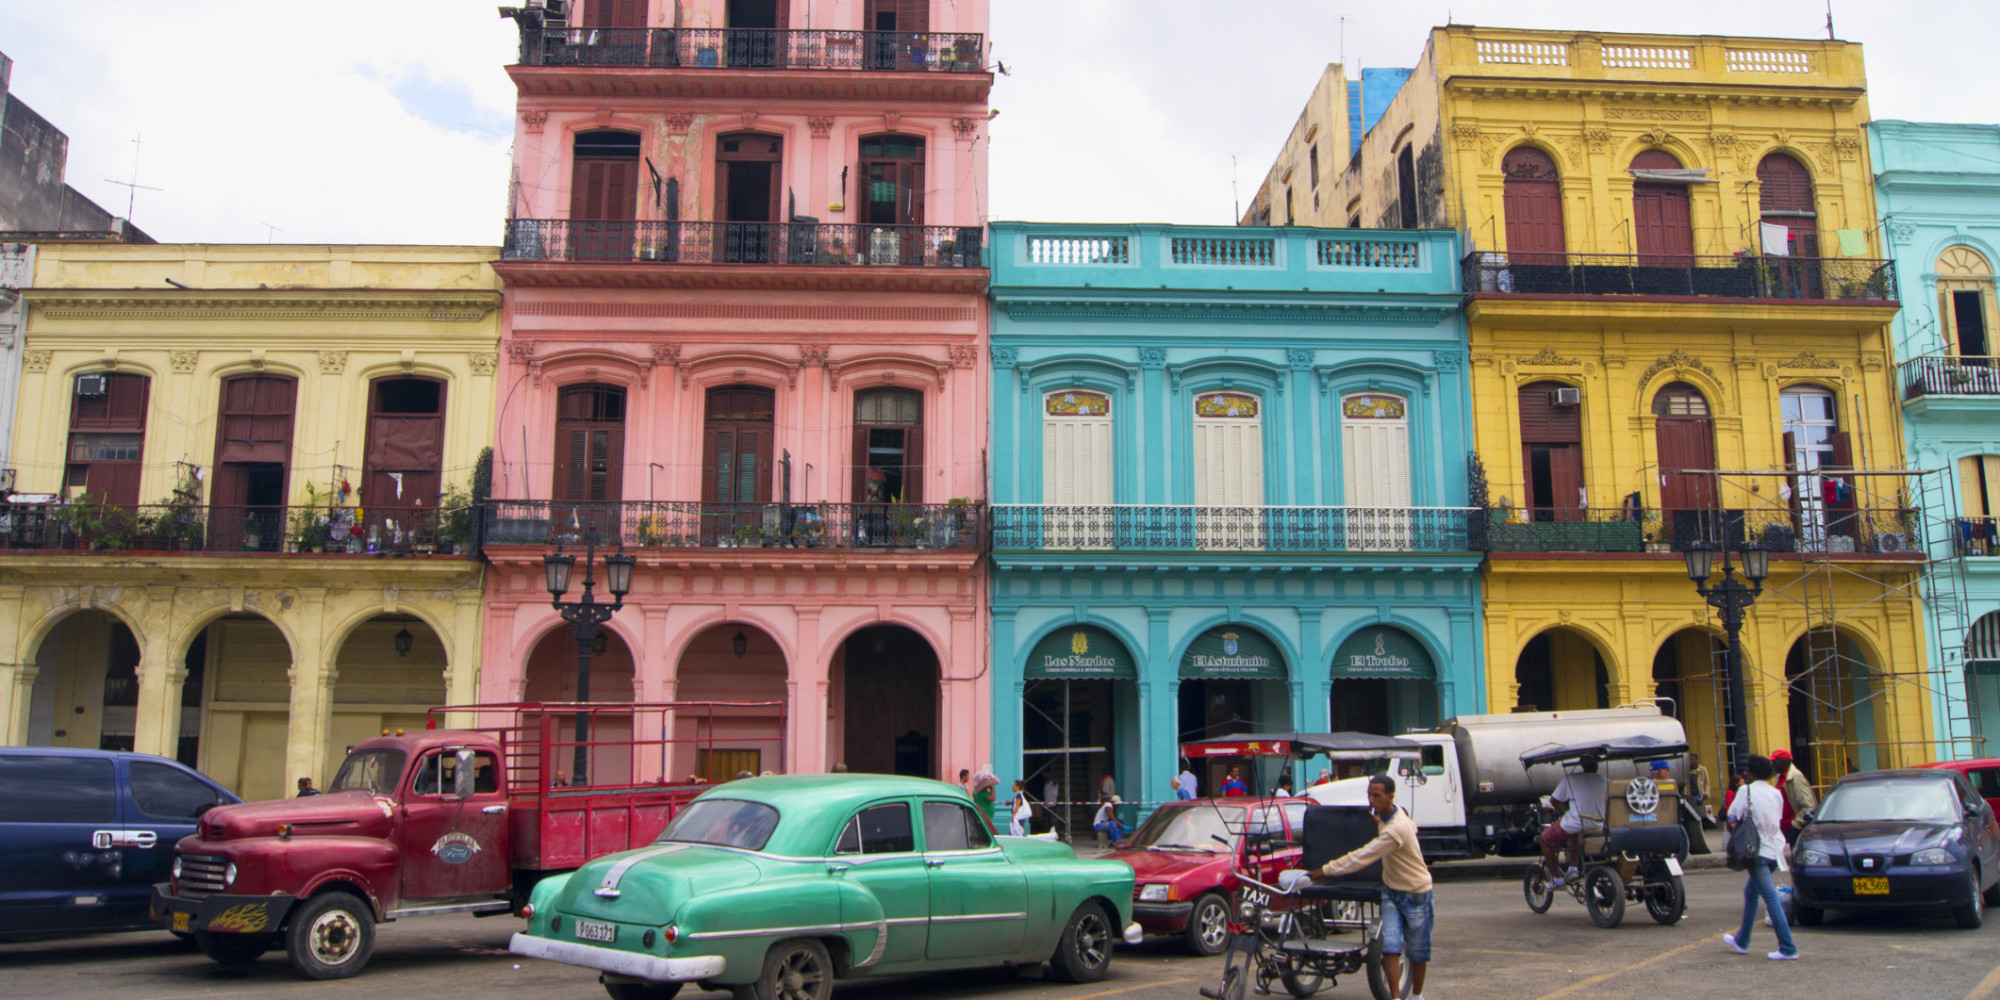 Vibrant streets of Cuba, one of Audrey's favorite destinations